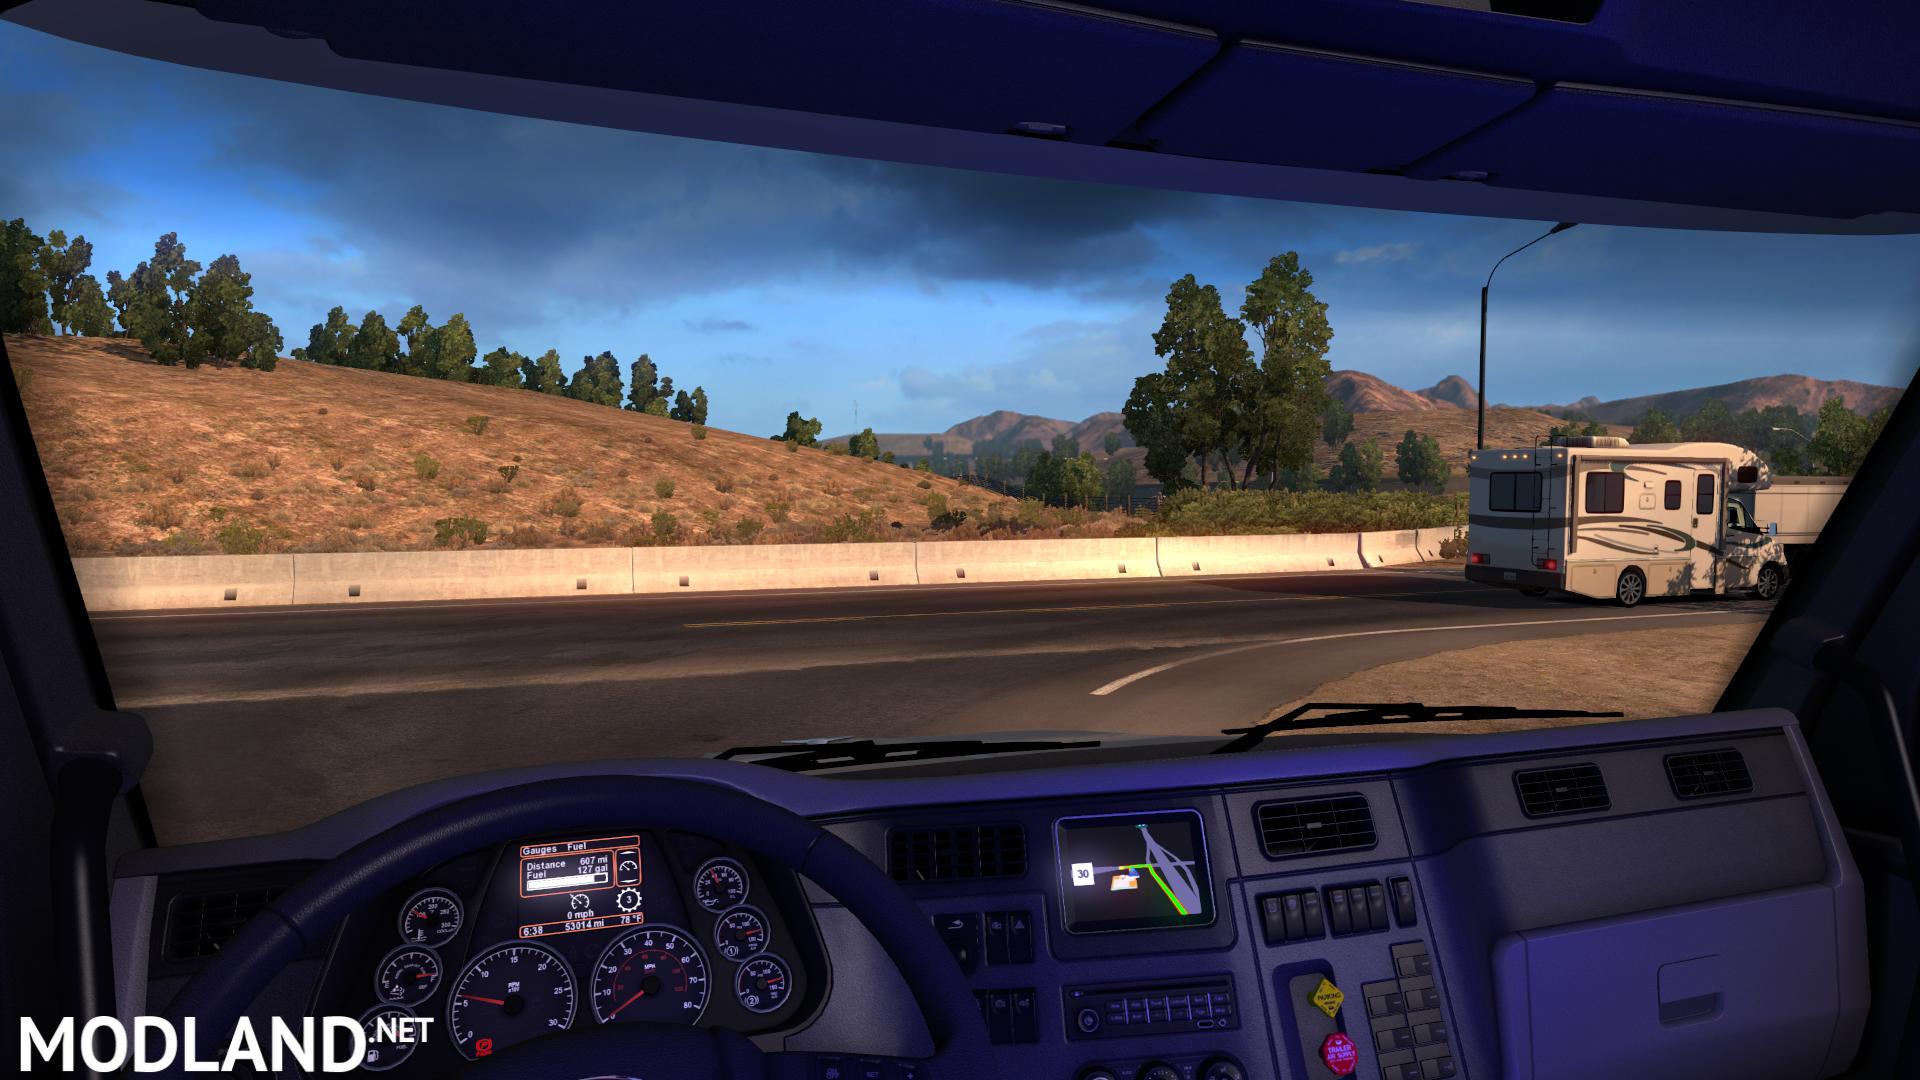 Cabin Interior Light mod for American Truck Simulator, ATS